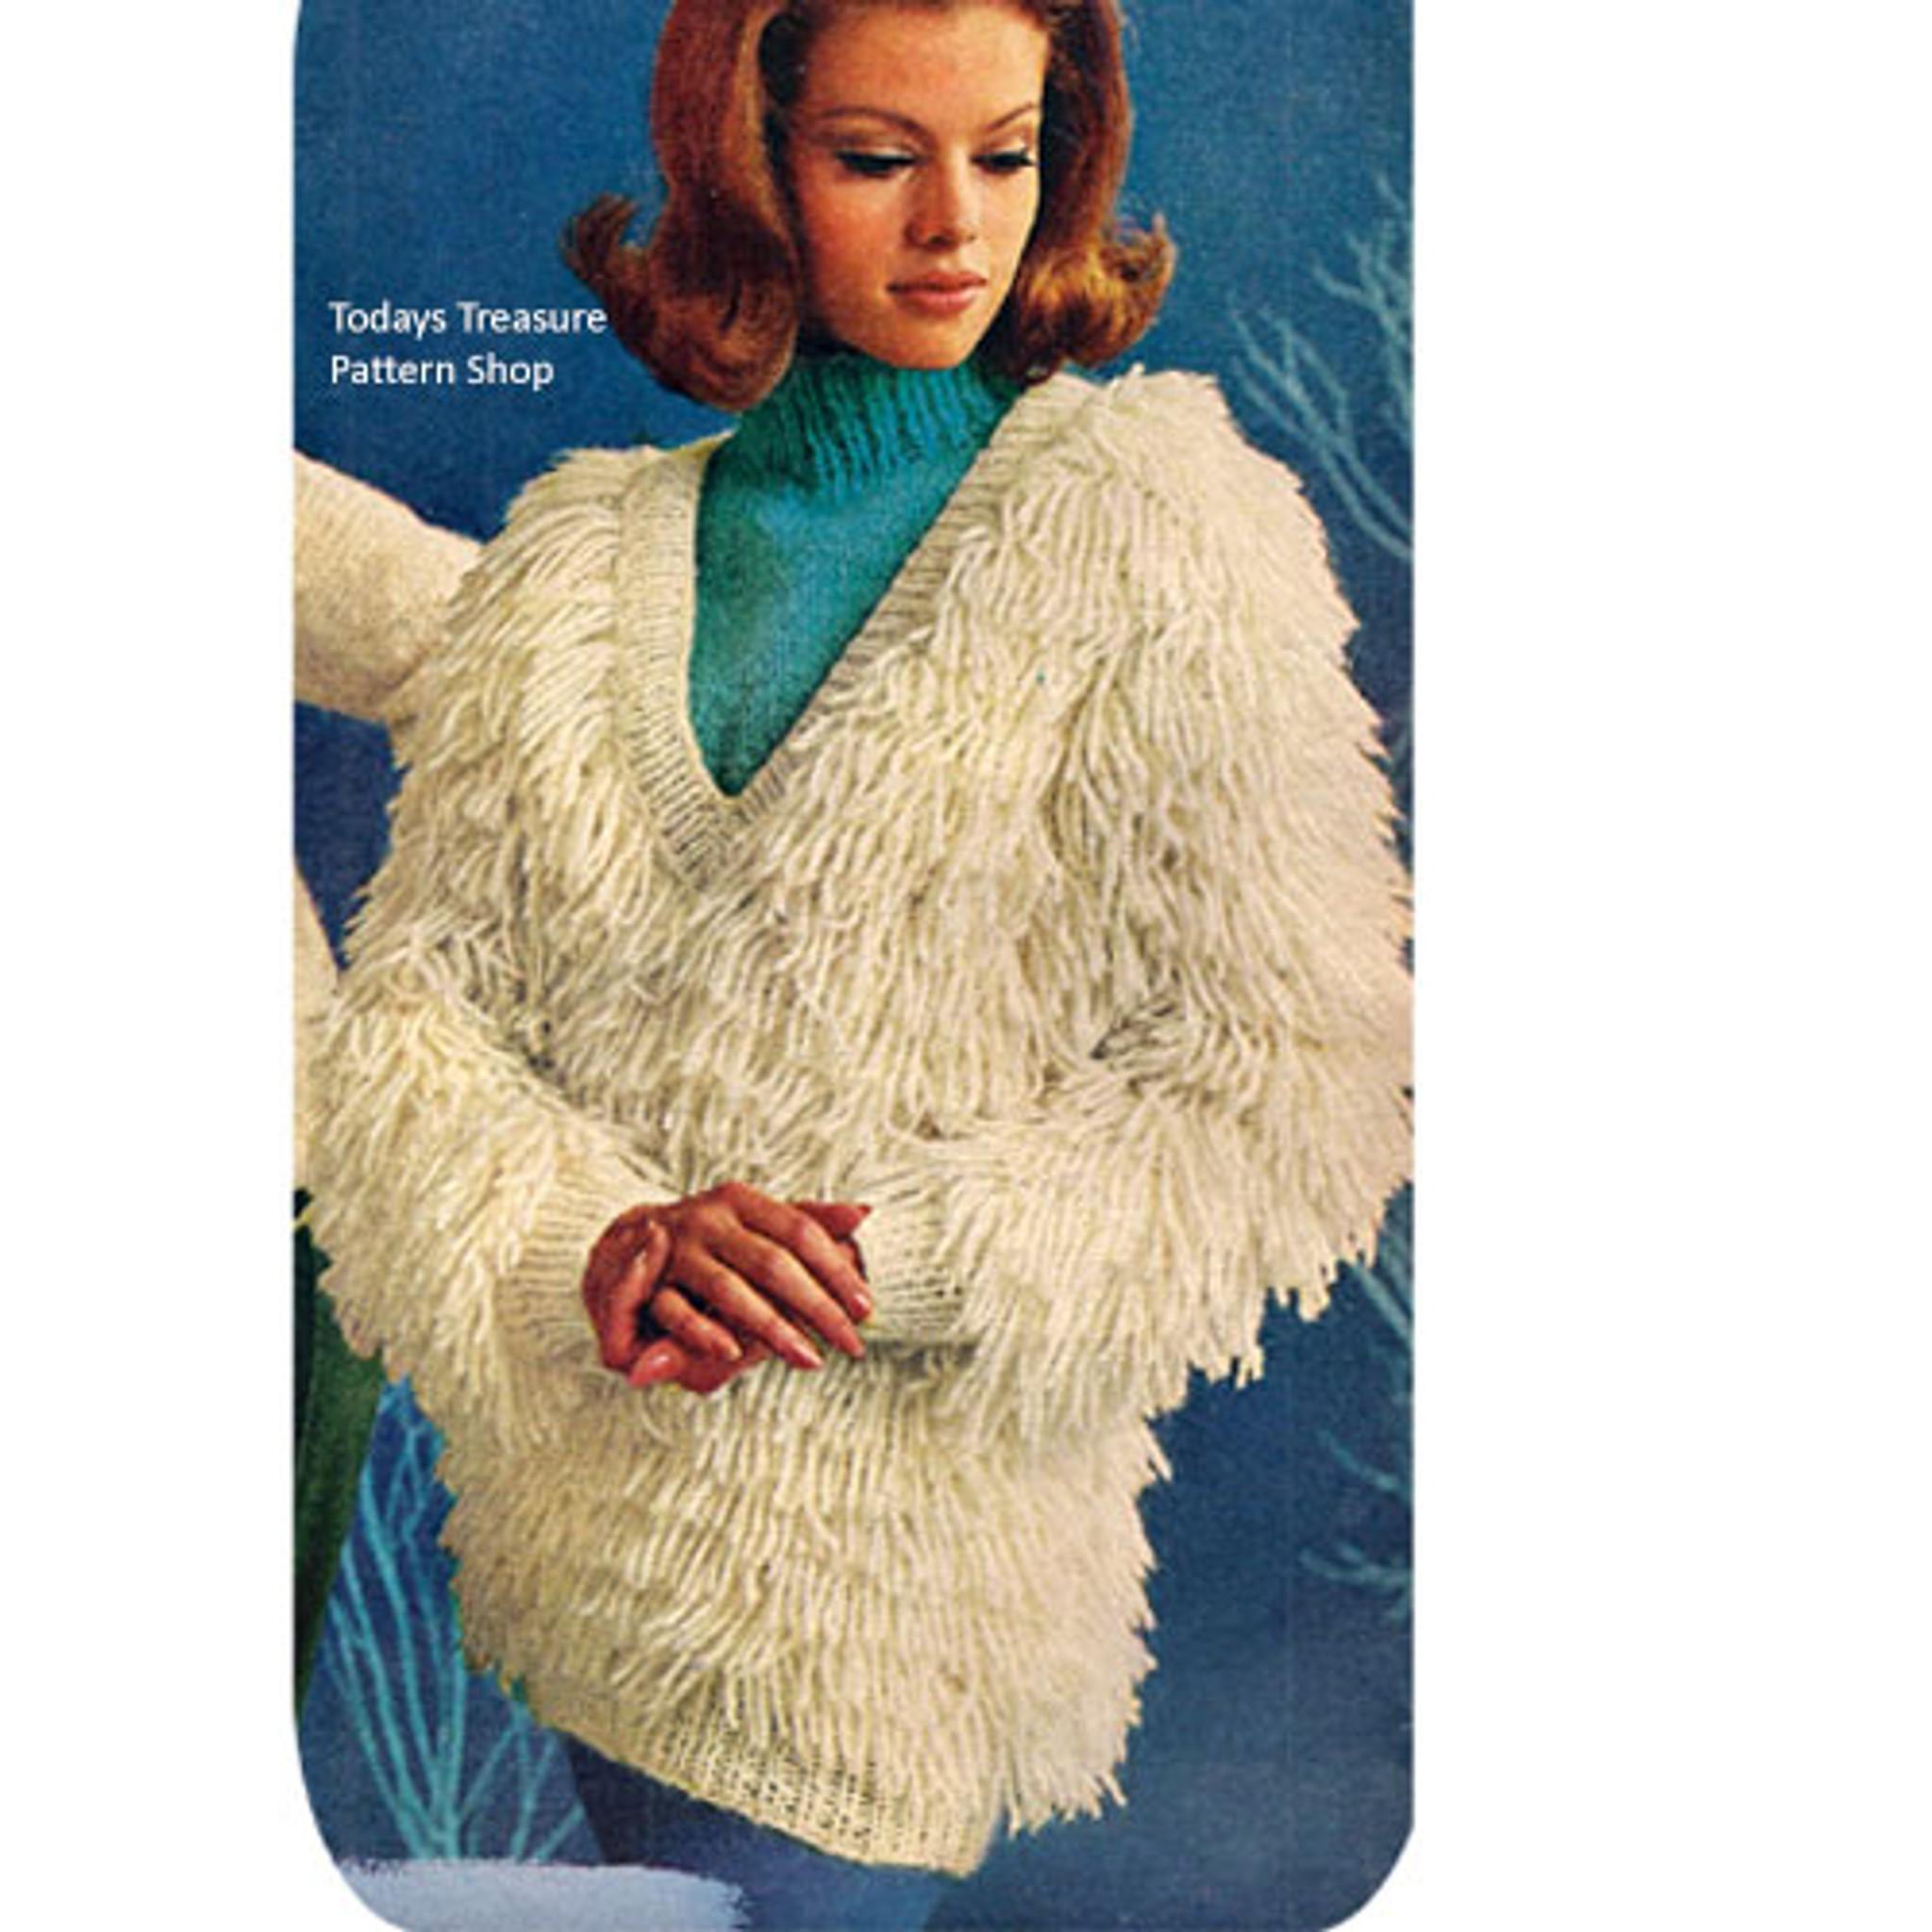 619624bded61 V-Neck Shaggy Pullover Knitting Pattern Vintage 1960s Loop ...